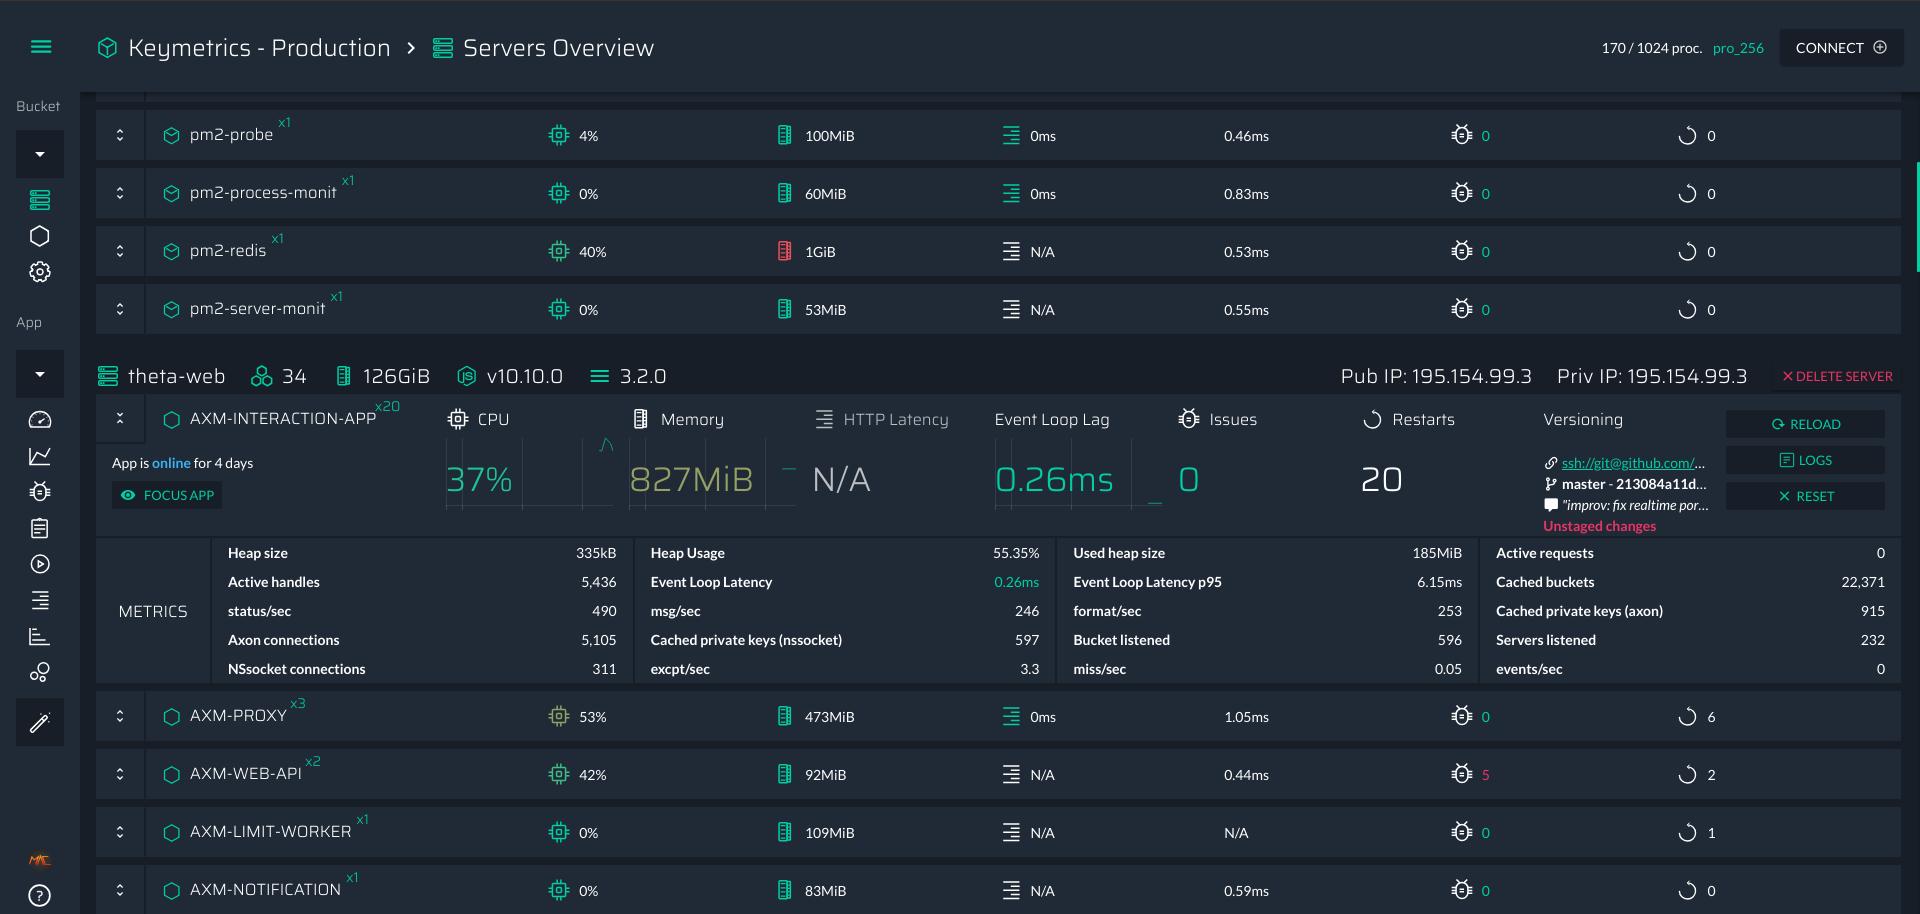 server overview